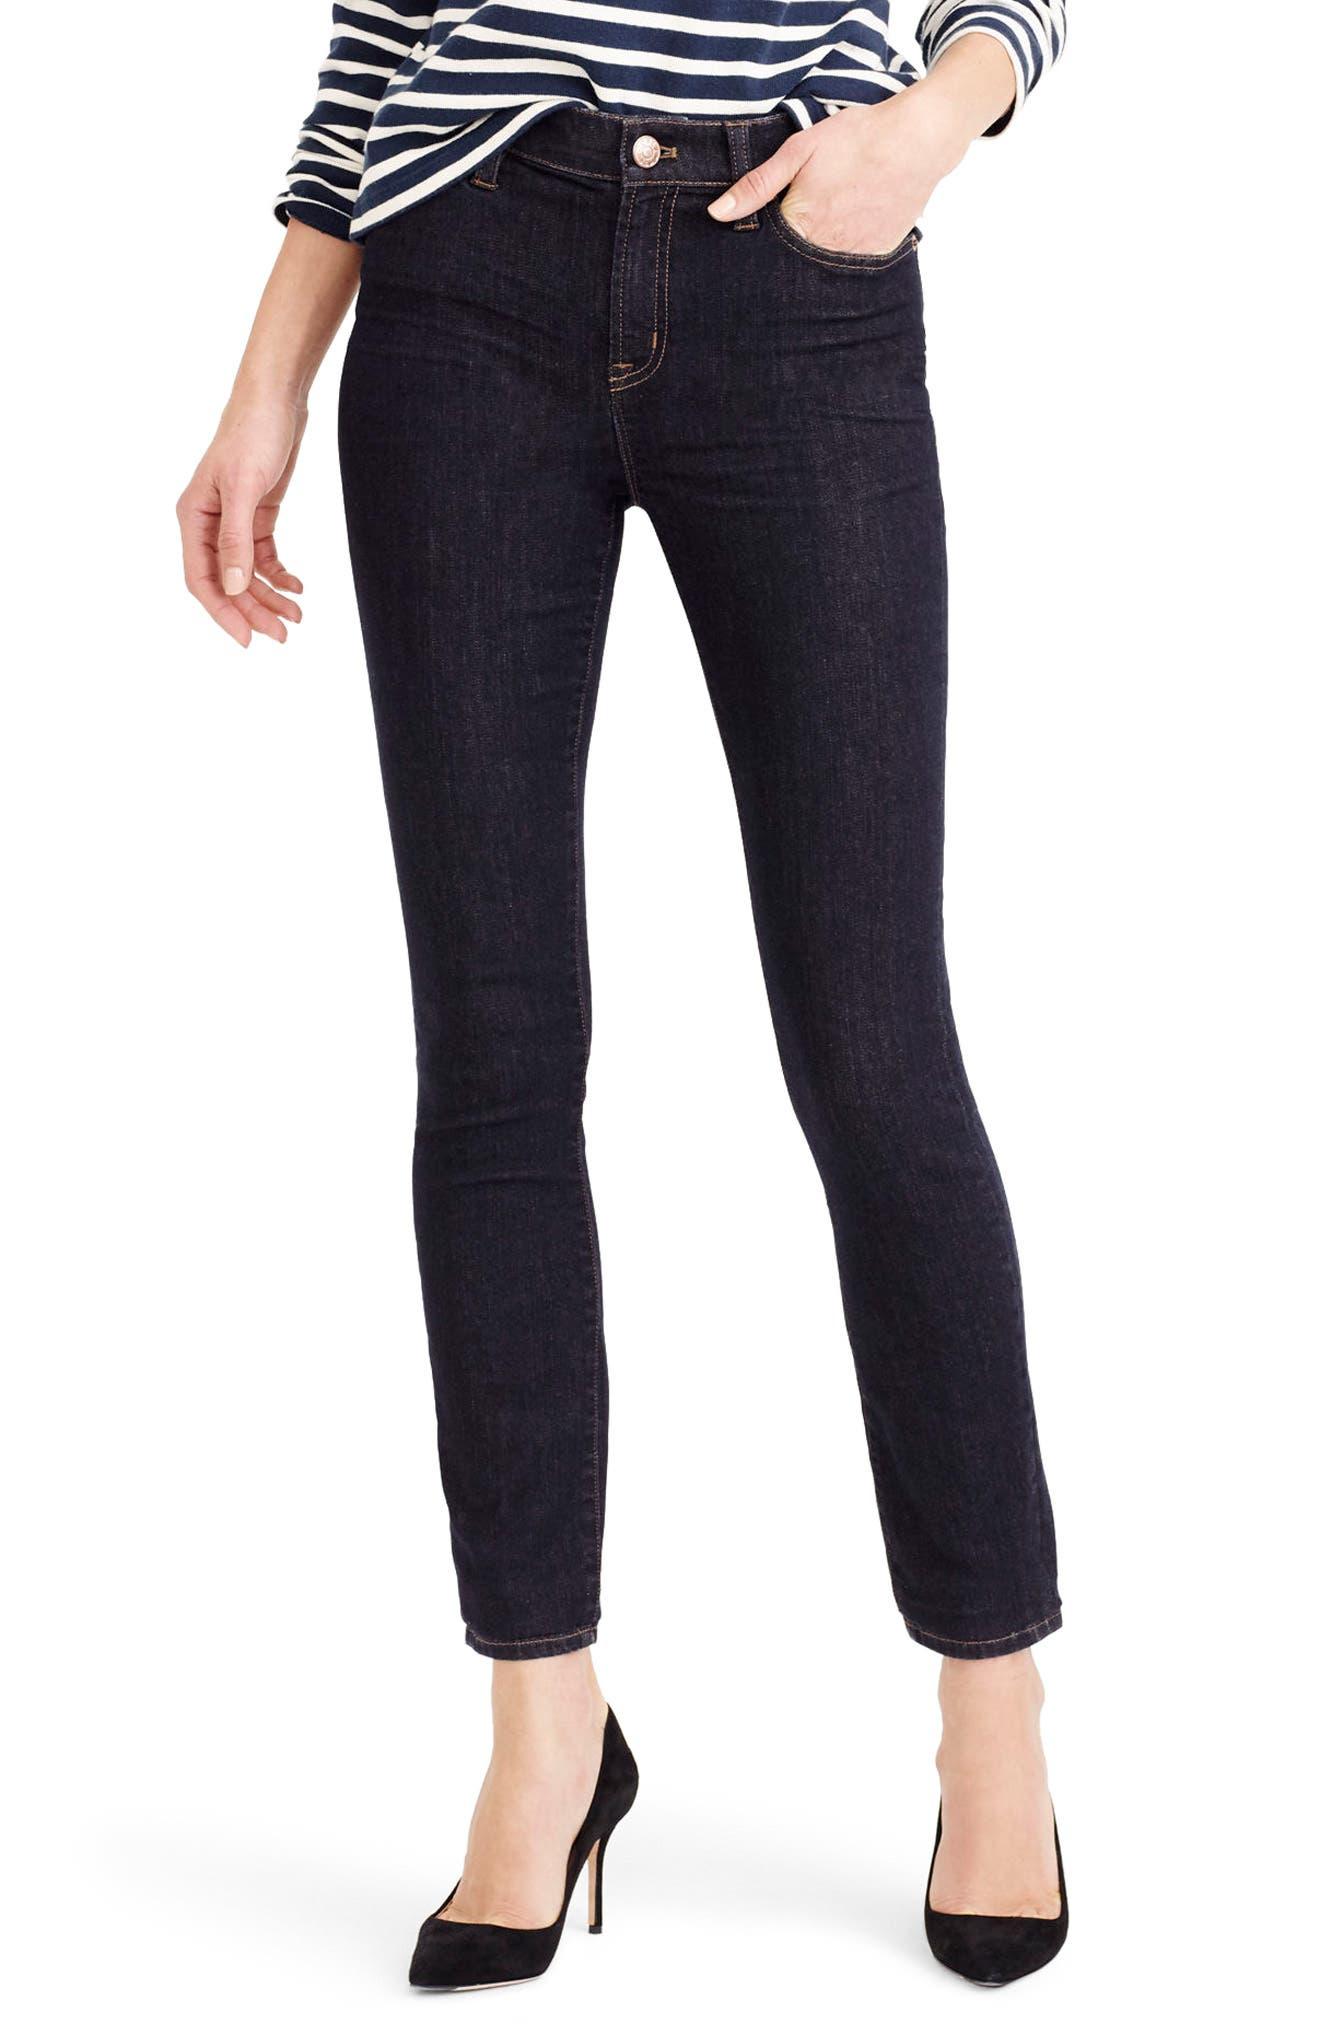 J.Crew Lookout High Rise Jeans (Resin) (Regular & Petite)